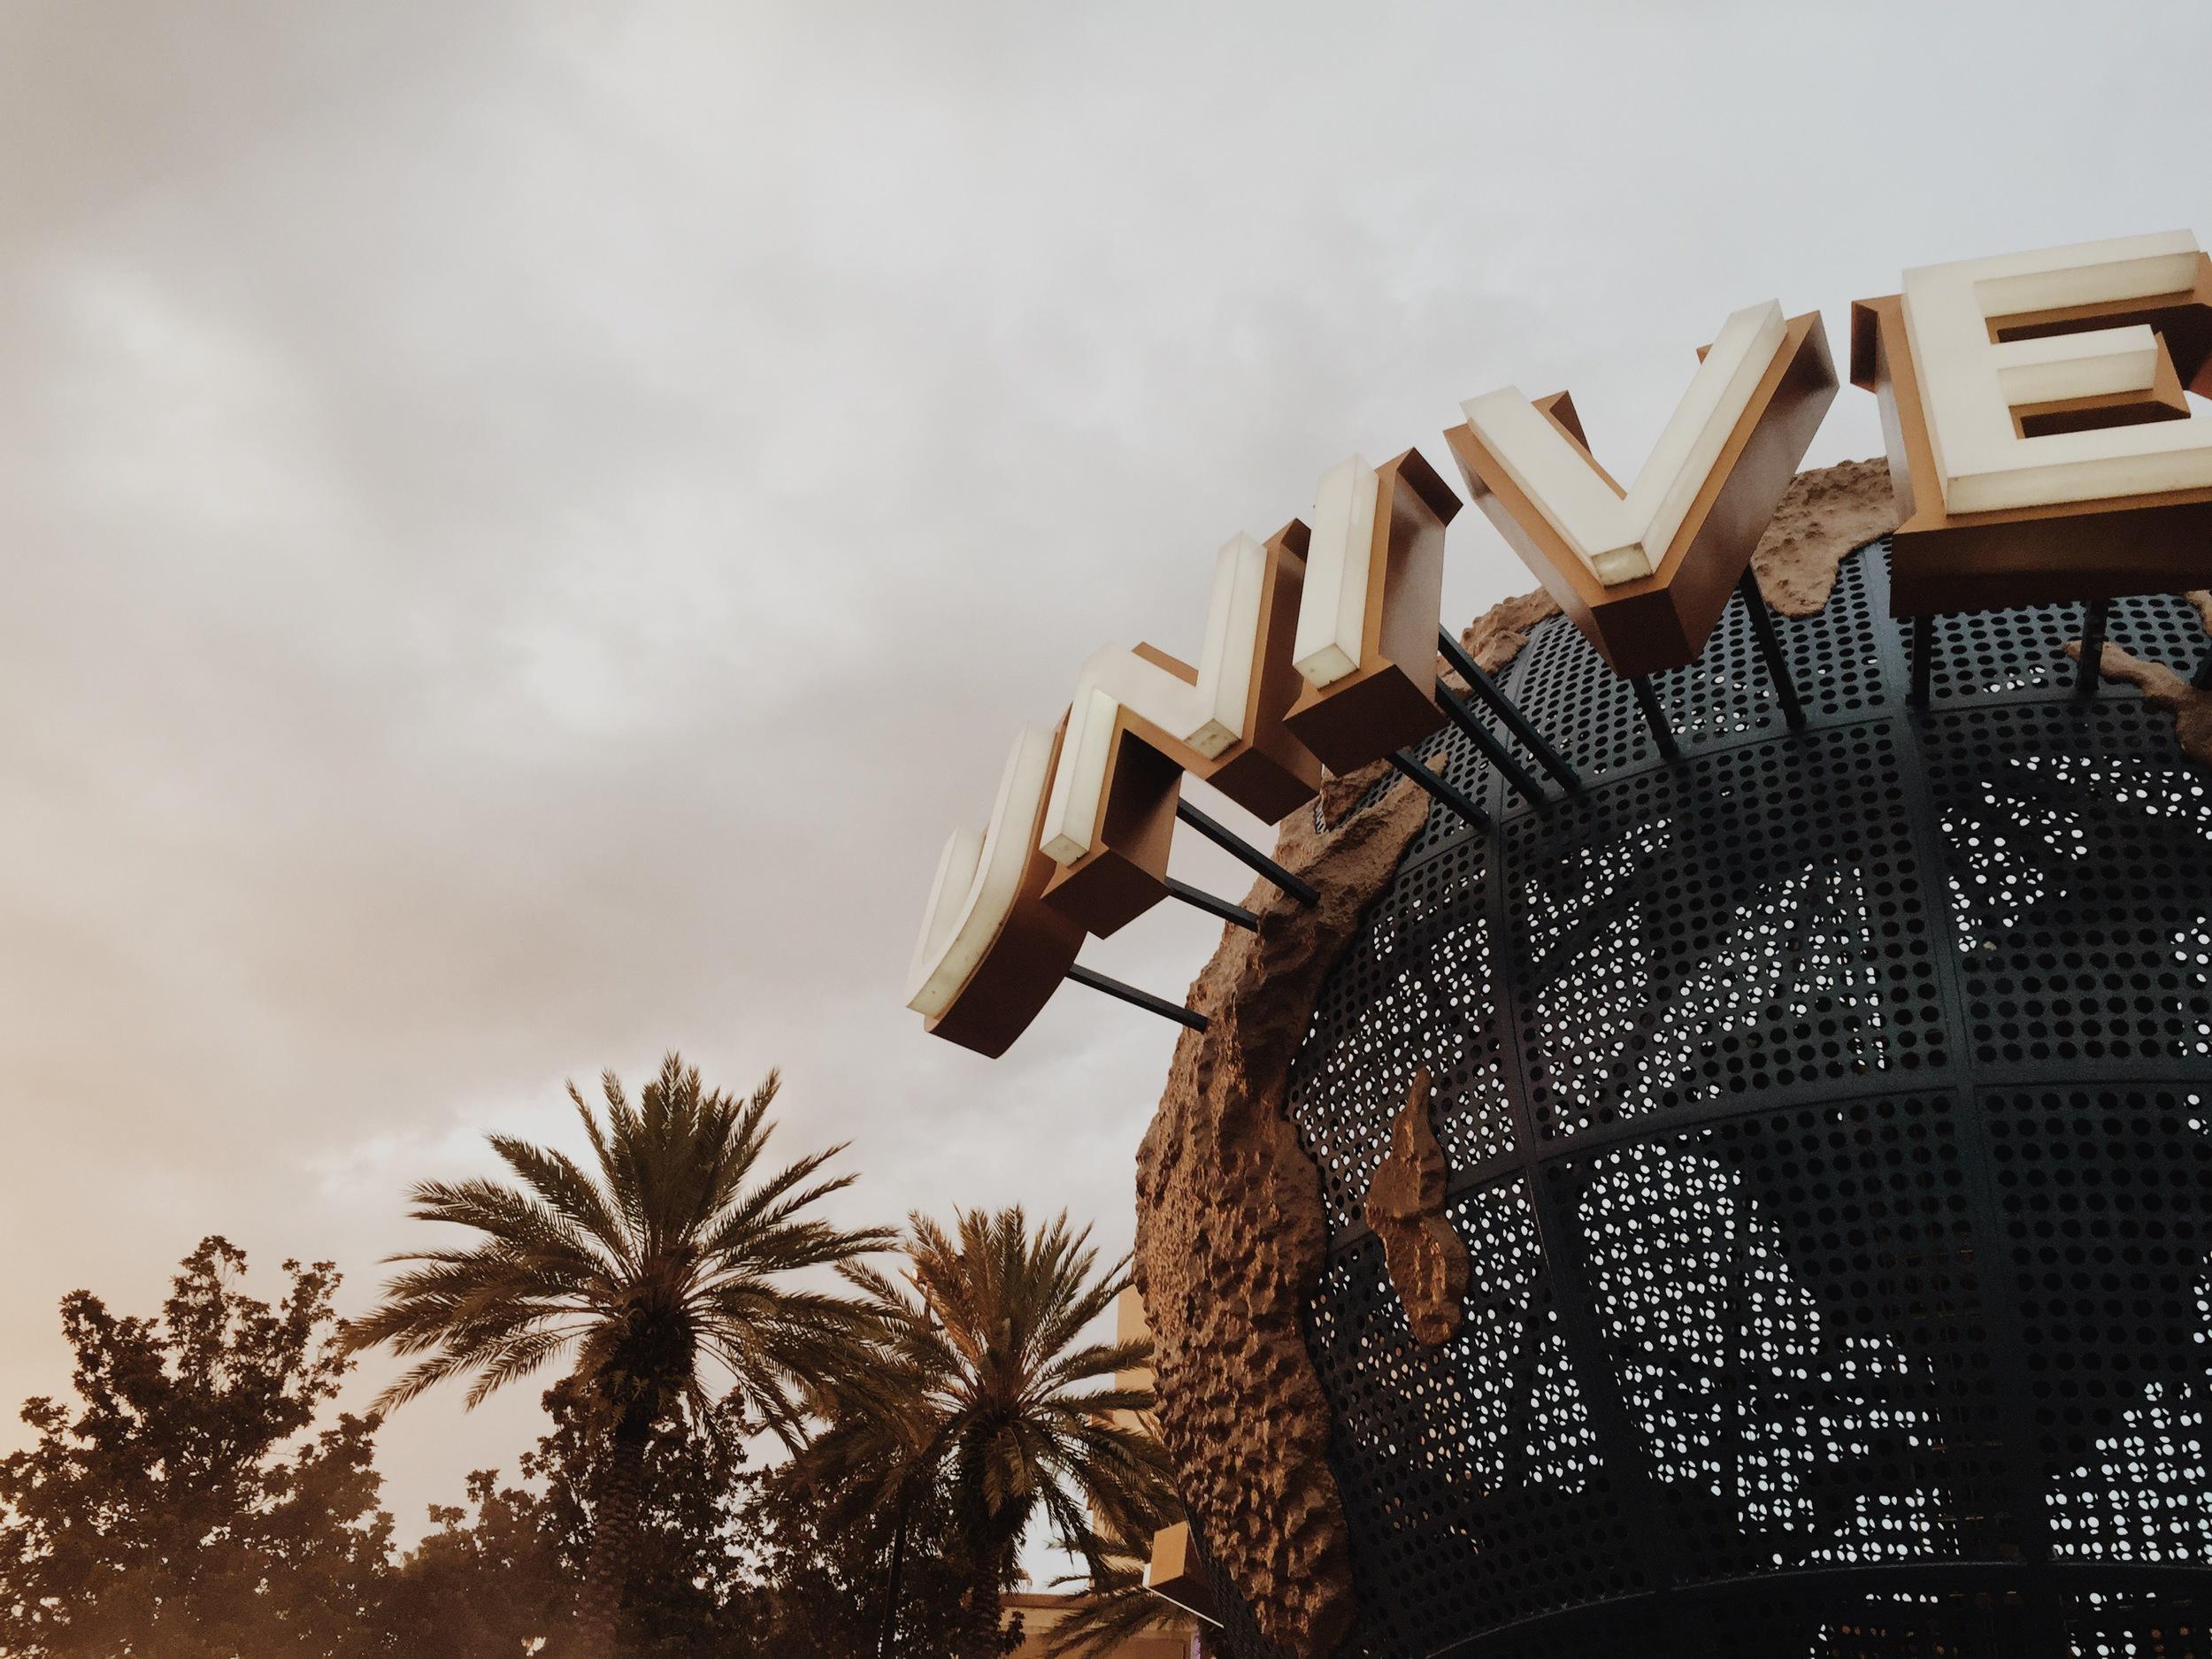 universal-orlando-sign-palm-trees